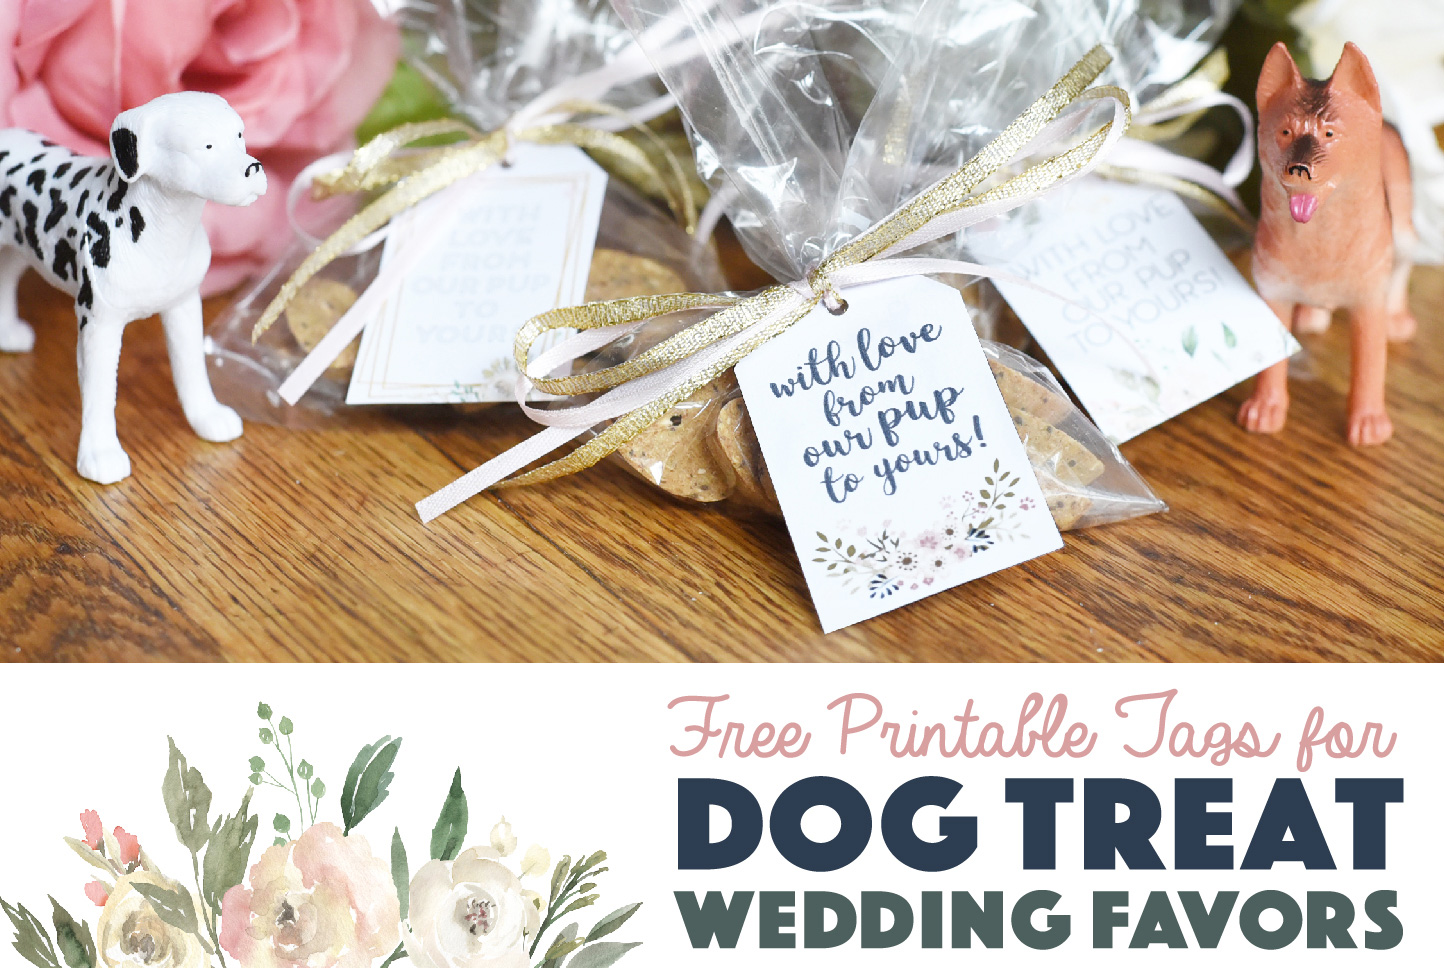 Free printable tags for dog treat wedding favors the broke dog free printable tags for dog treat wedding favors junglespirit Gallery